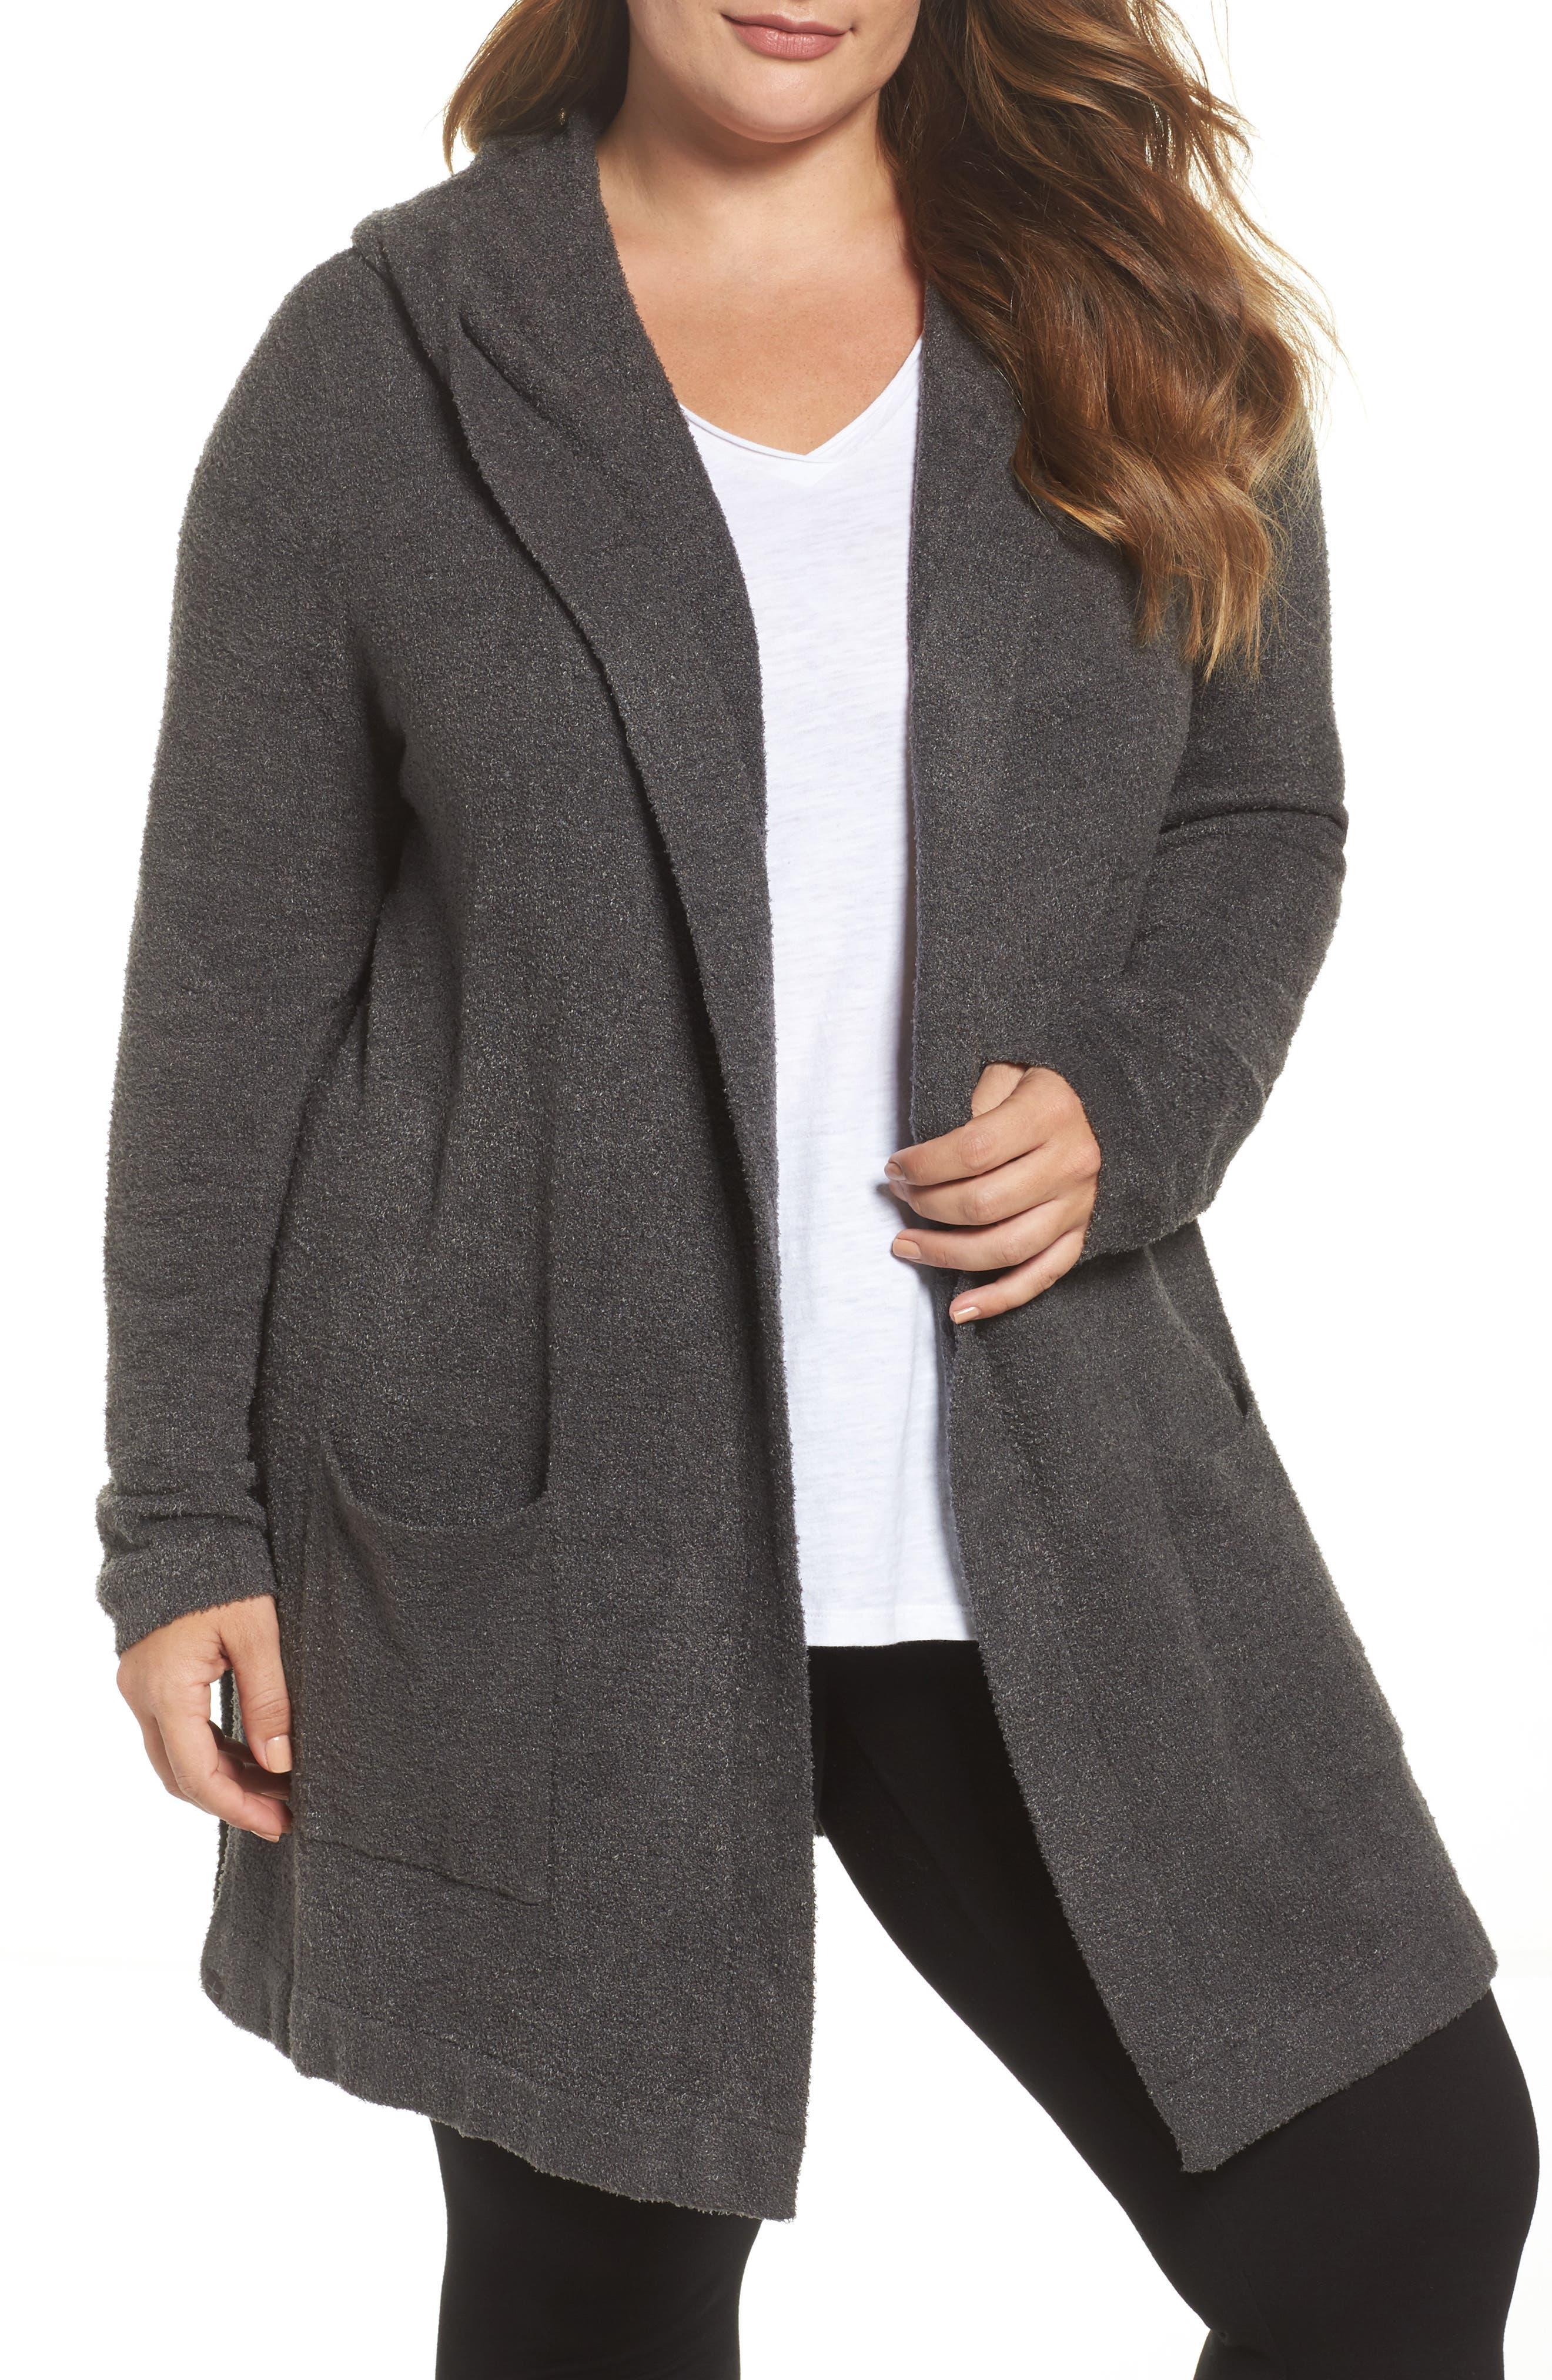 Cozychic Lite<sup>®</sup> Coastal Hooded Cardigan,                         Main,                         color, CARBON